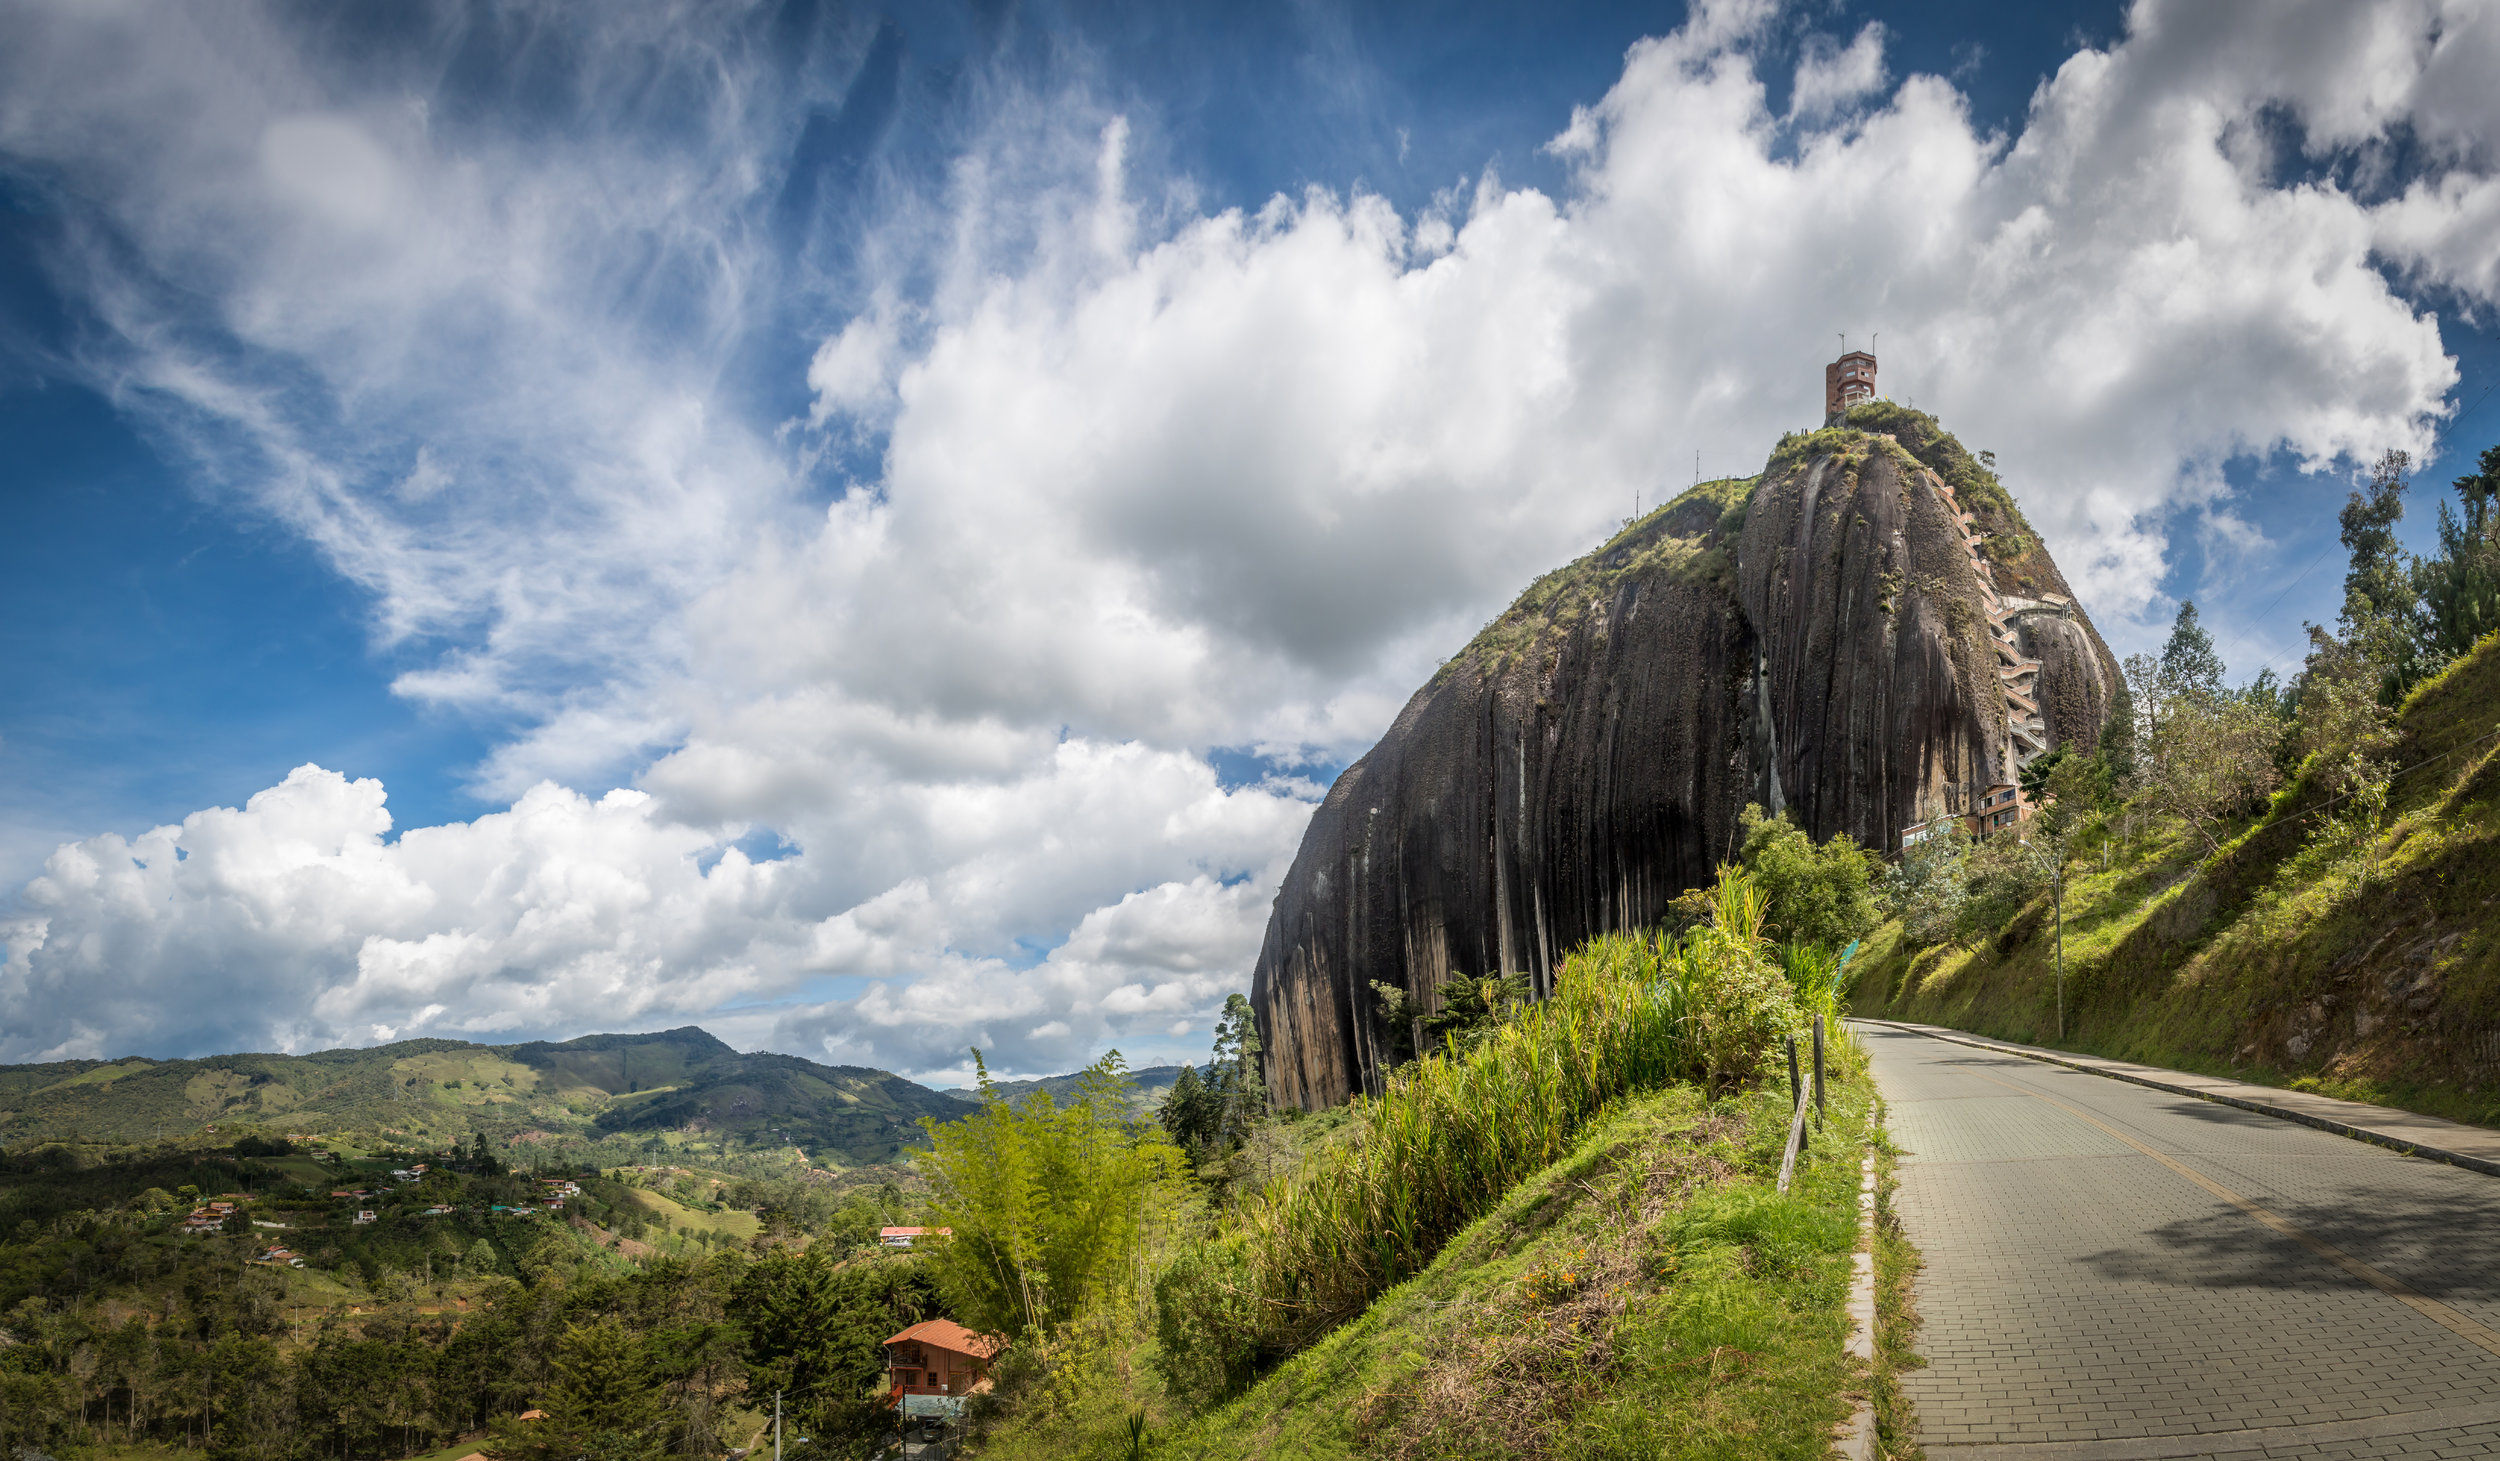 Høyt og lavt i Colombia med Espnes. Majestetisk natur og unike destinasjoner. Luksusreise fra millionbyen Bogotá, til en underjordisk katedral, El  Dorado, ørken, arkeologiske skatter